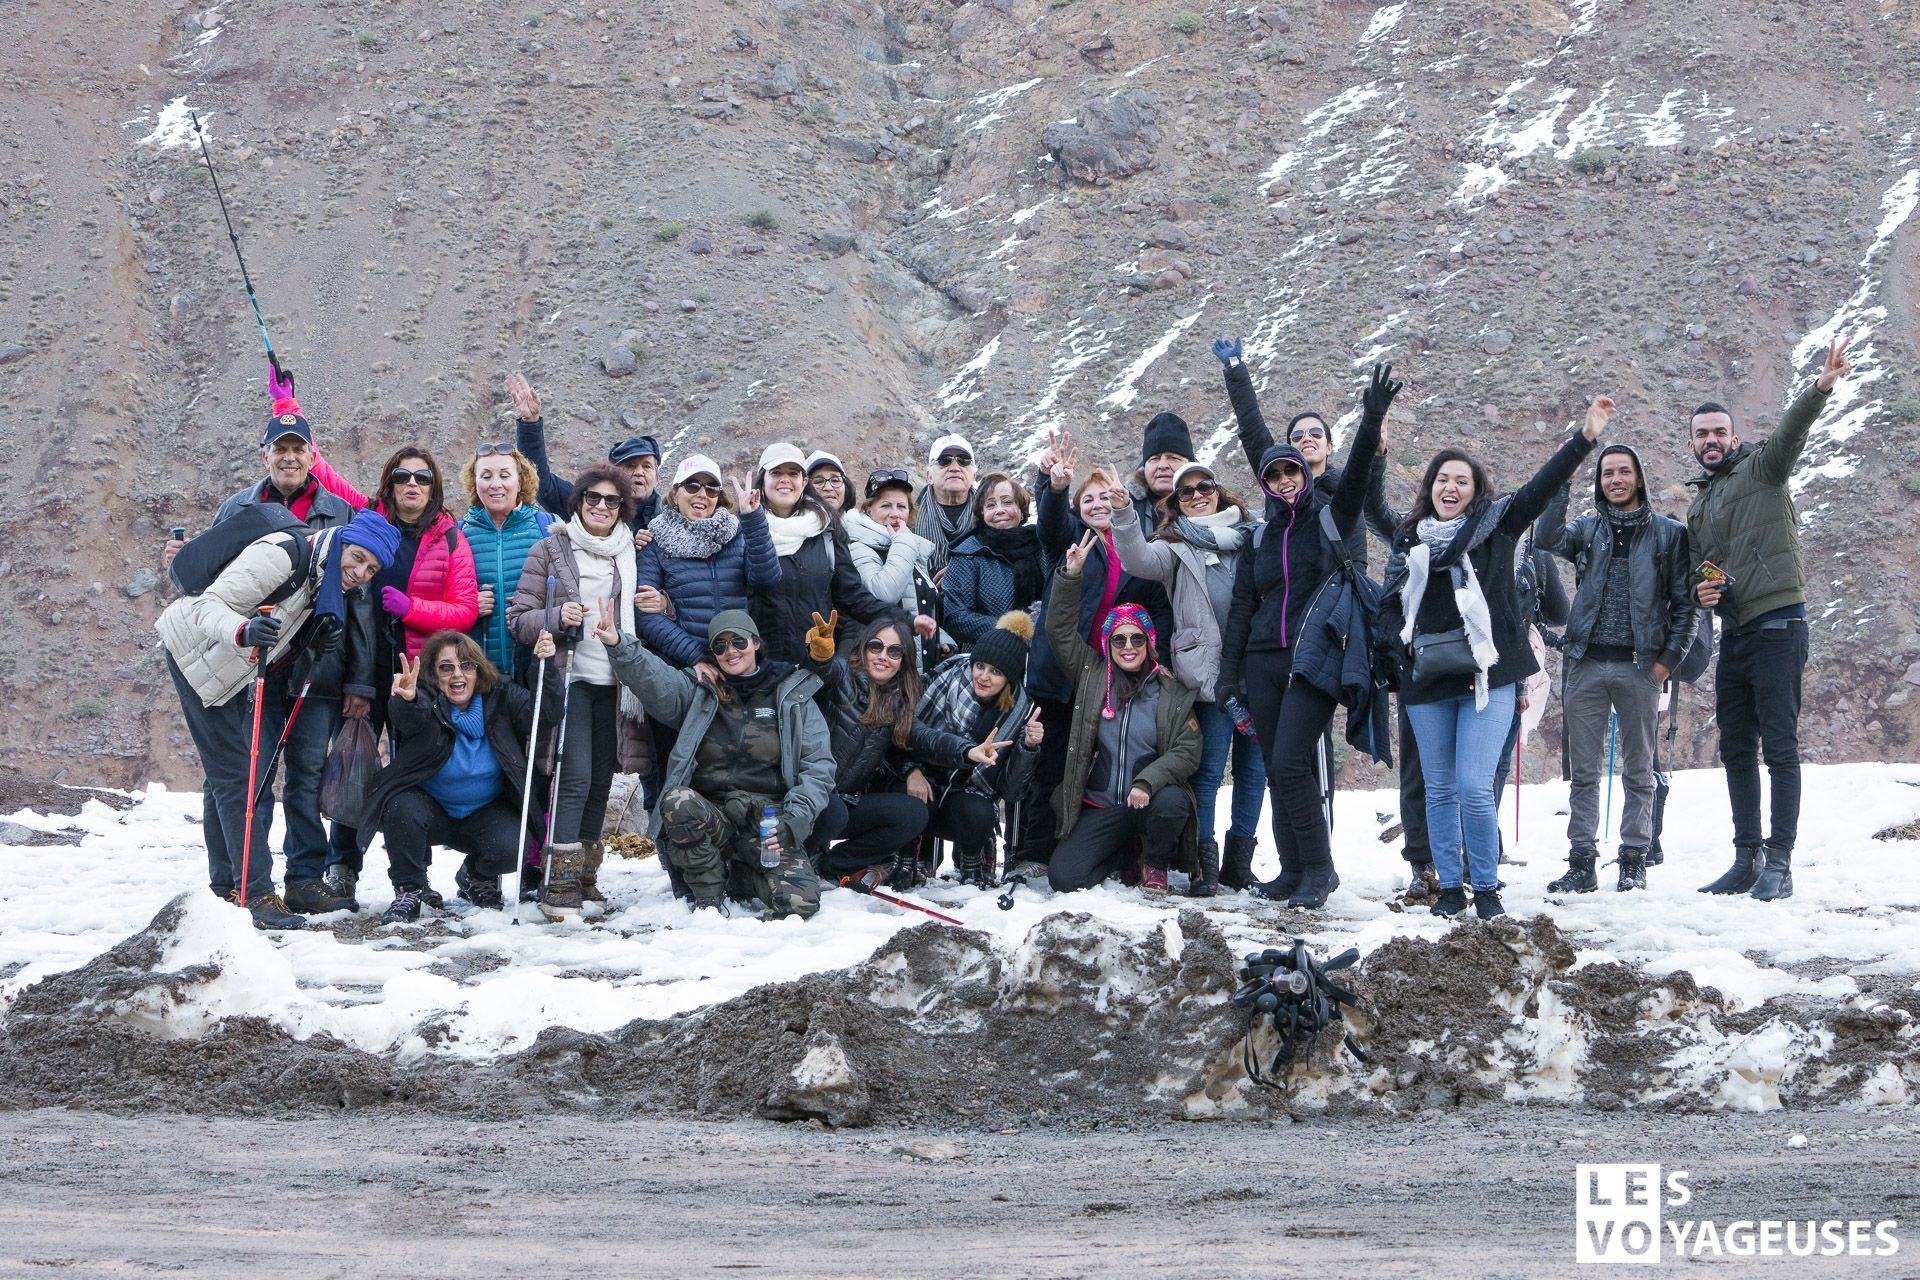 Les-voyageuses-maroc-imlil-hiver-00085